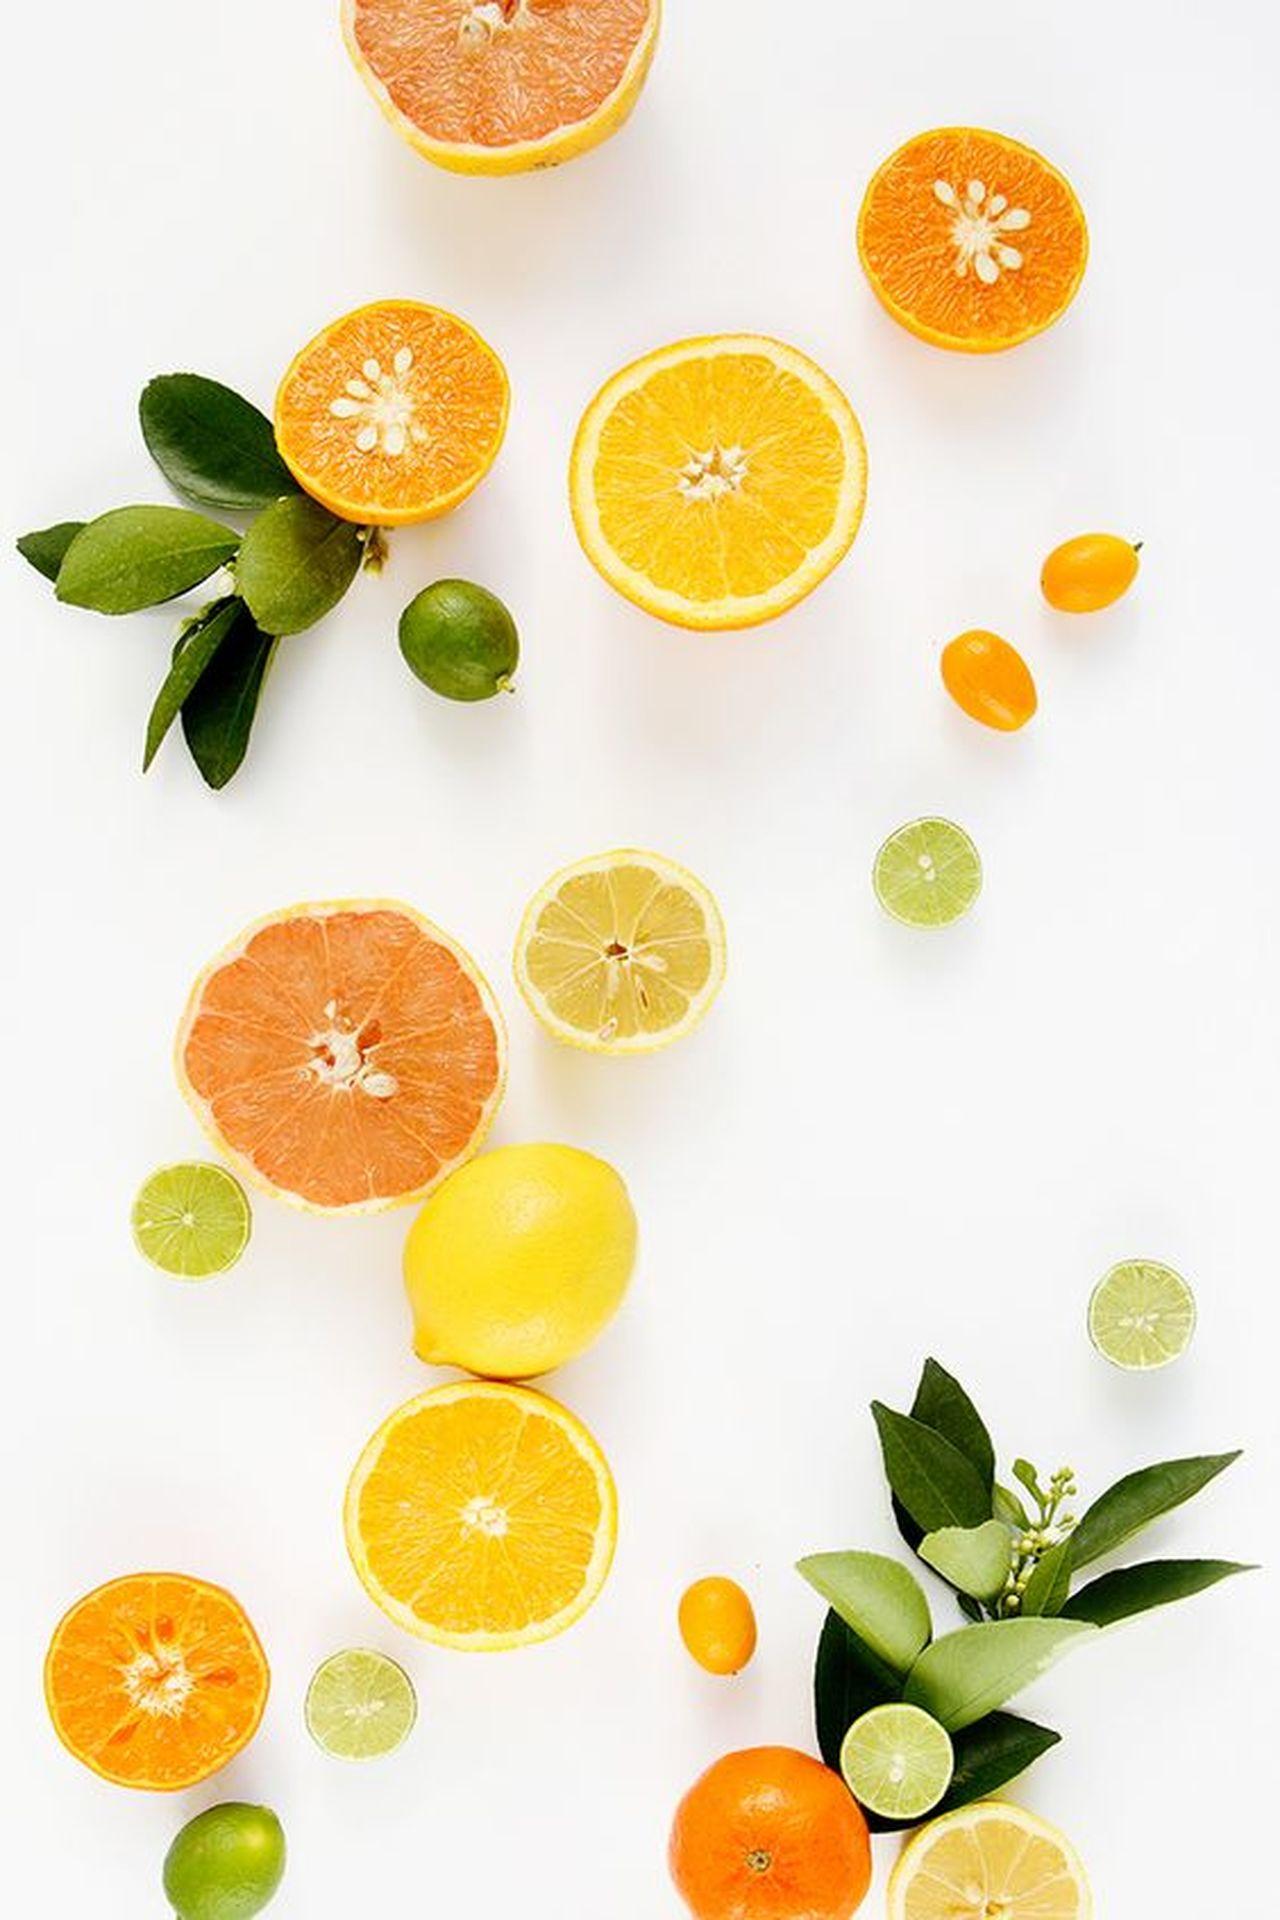 Juicy Food Orange Color Yellow Fruit Citrus Fruit Lemon White Background Healthy Eating Group Of Objects Variation Freshness Vitamin Grapefruit Nature SLICE Vegetarian Food Sour Taste No People Kiwi - Fruit